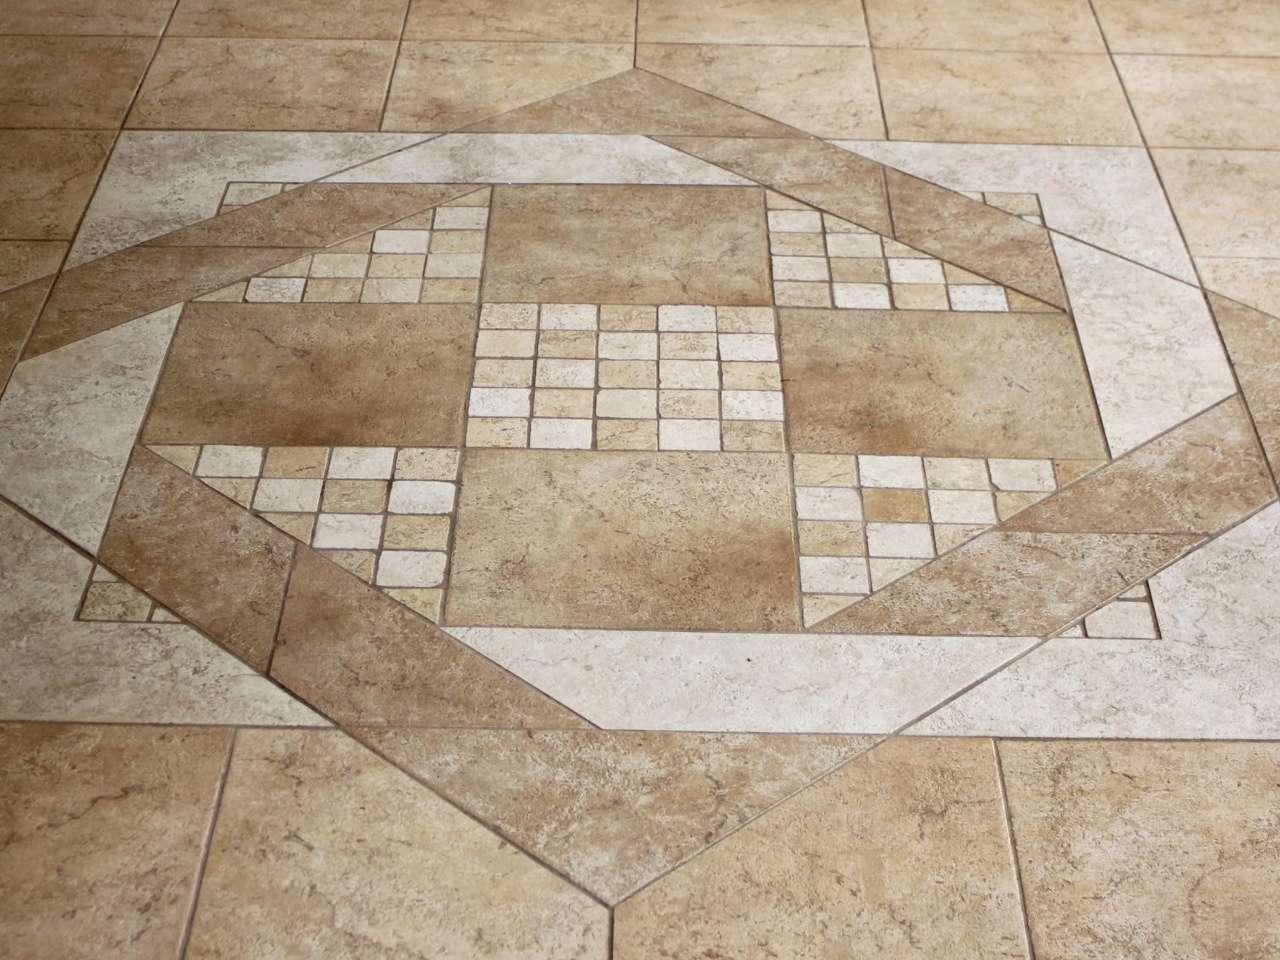 vigas tile installation birmingham